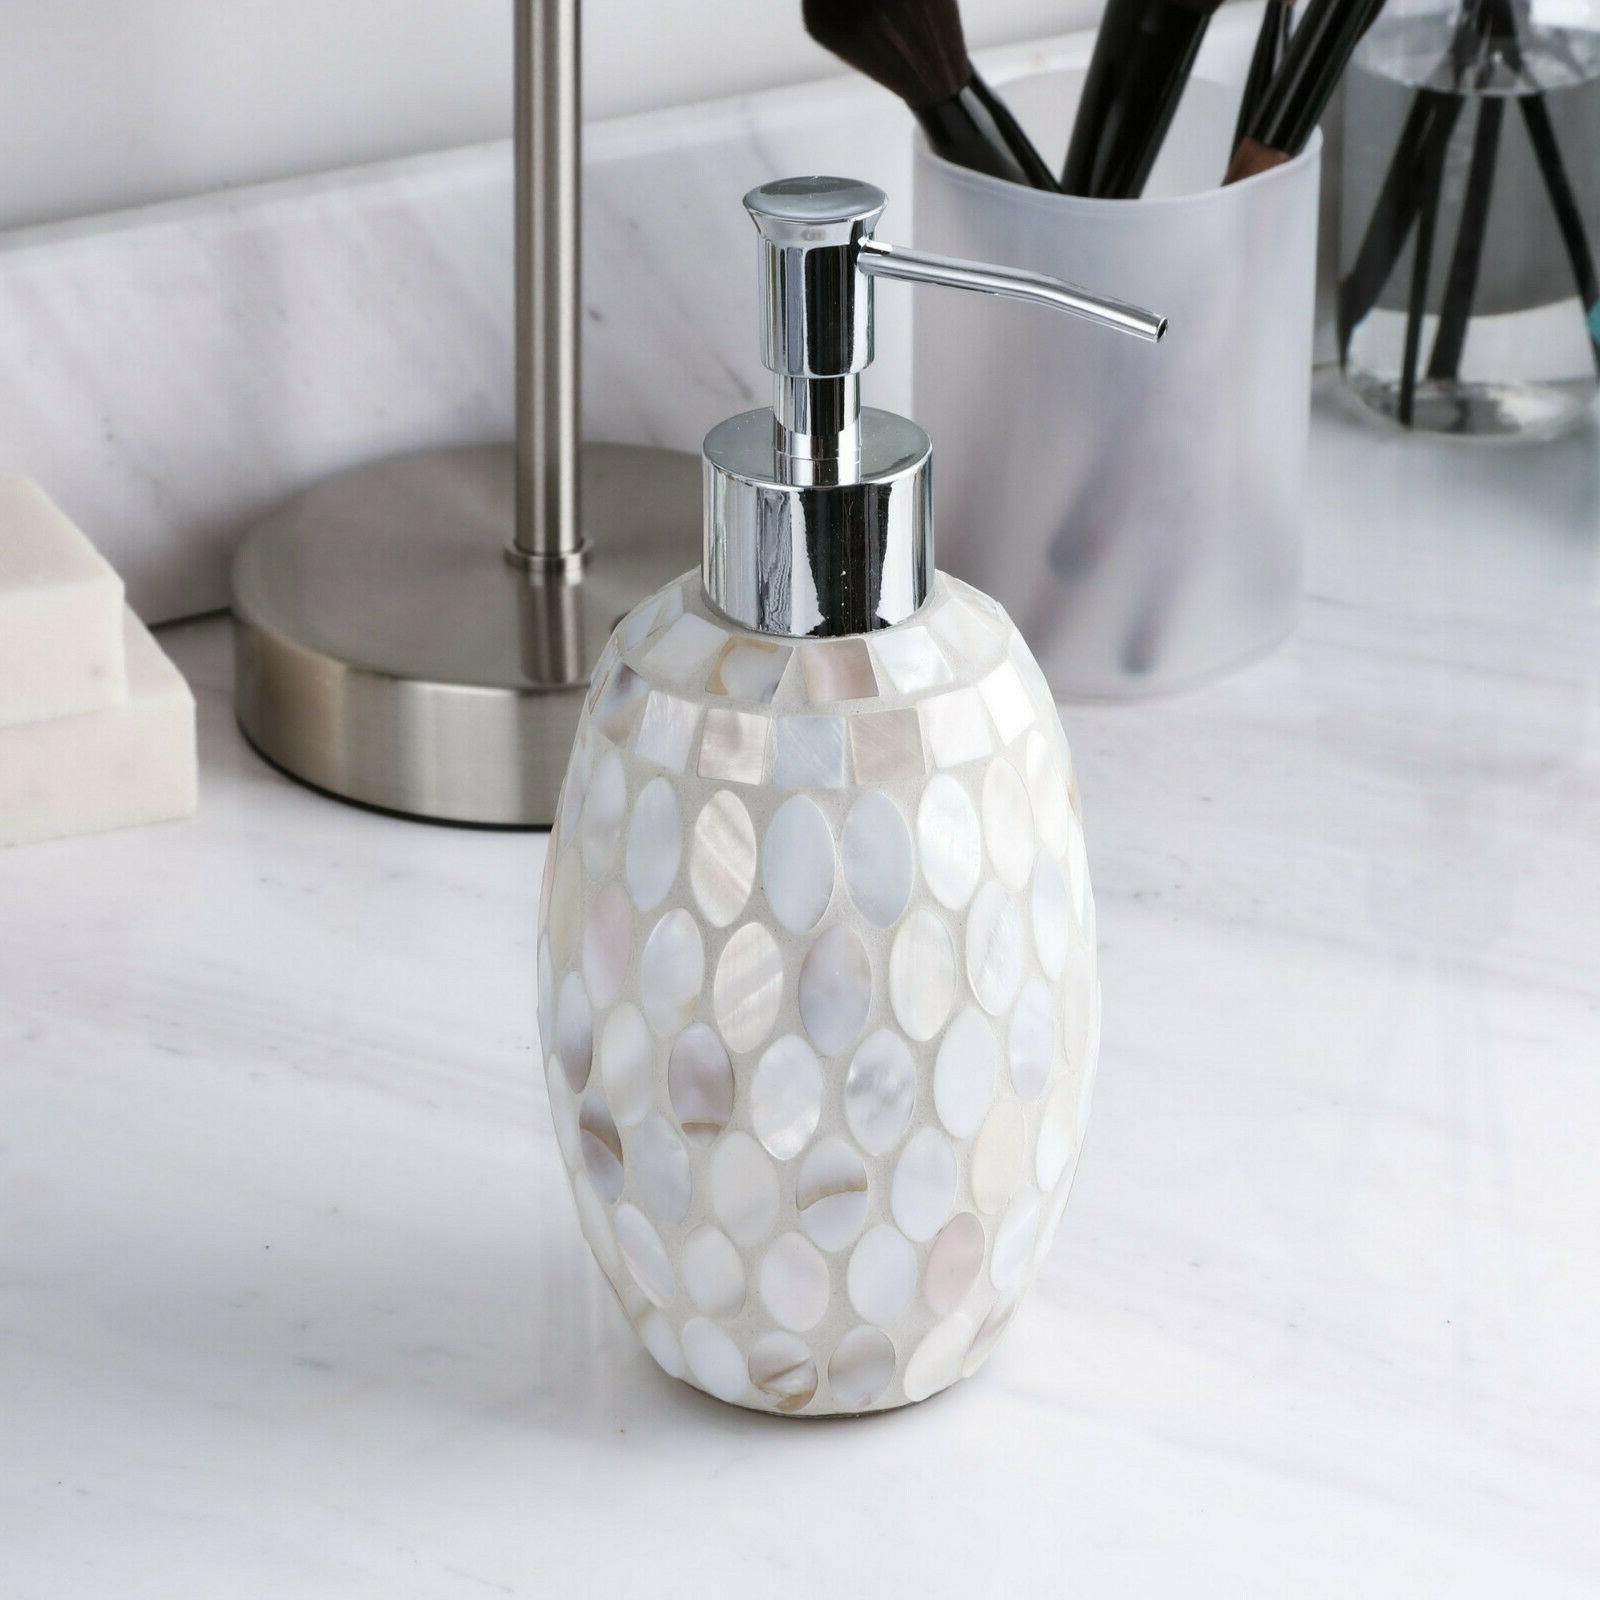 2PC Set Pearl Mosaic GLass Soap/Lotion Dispenser w Pump - Ba